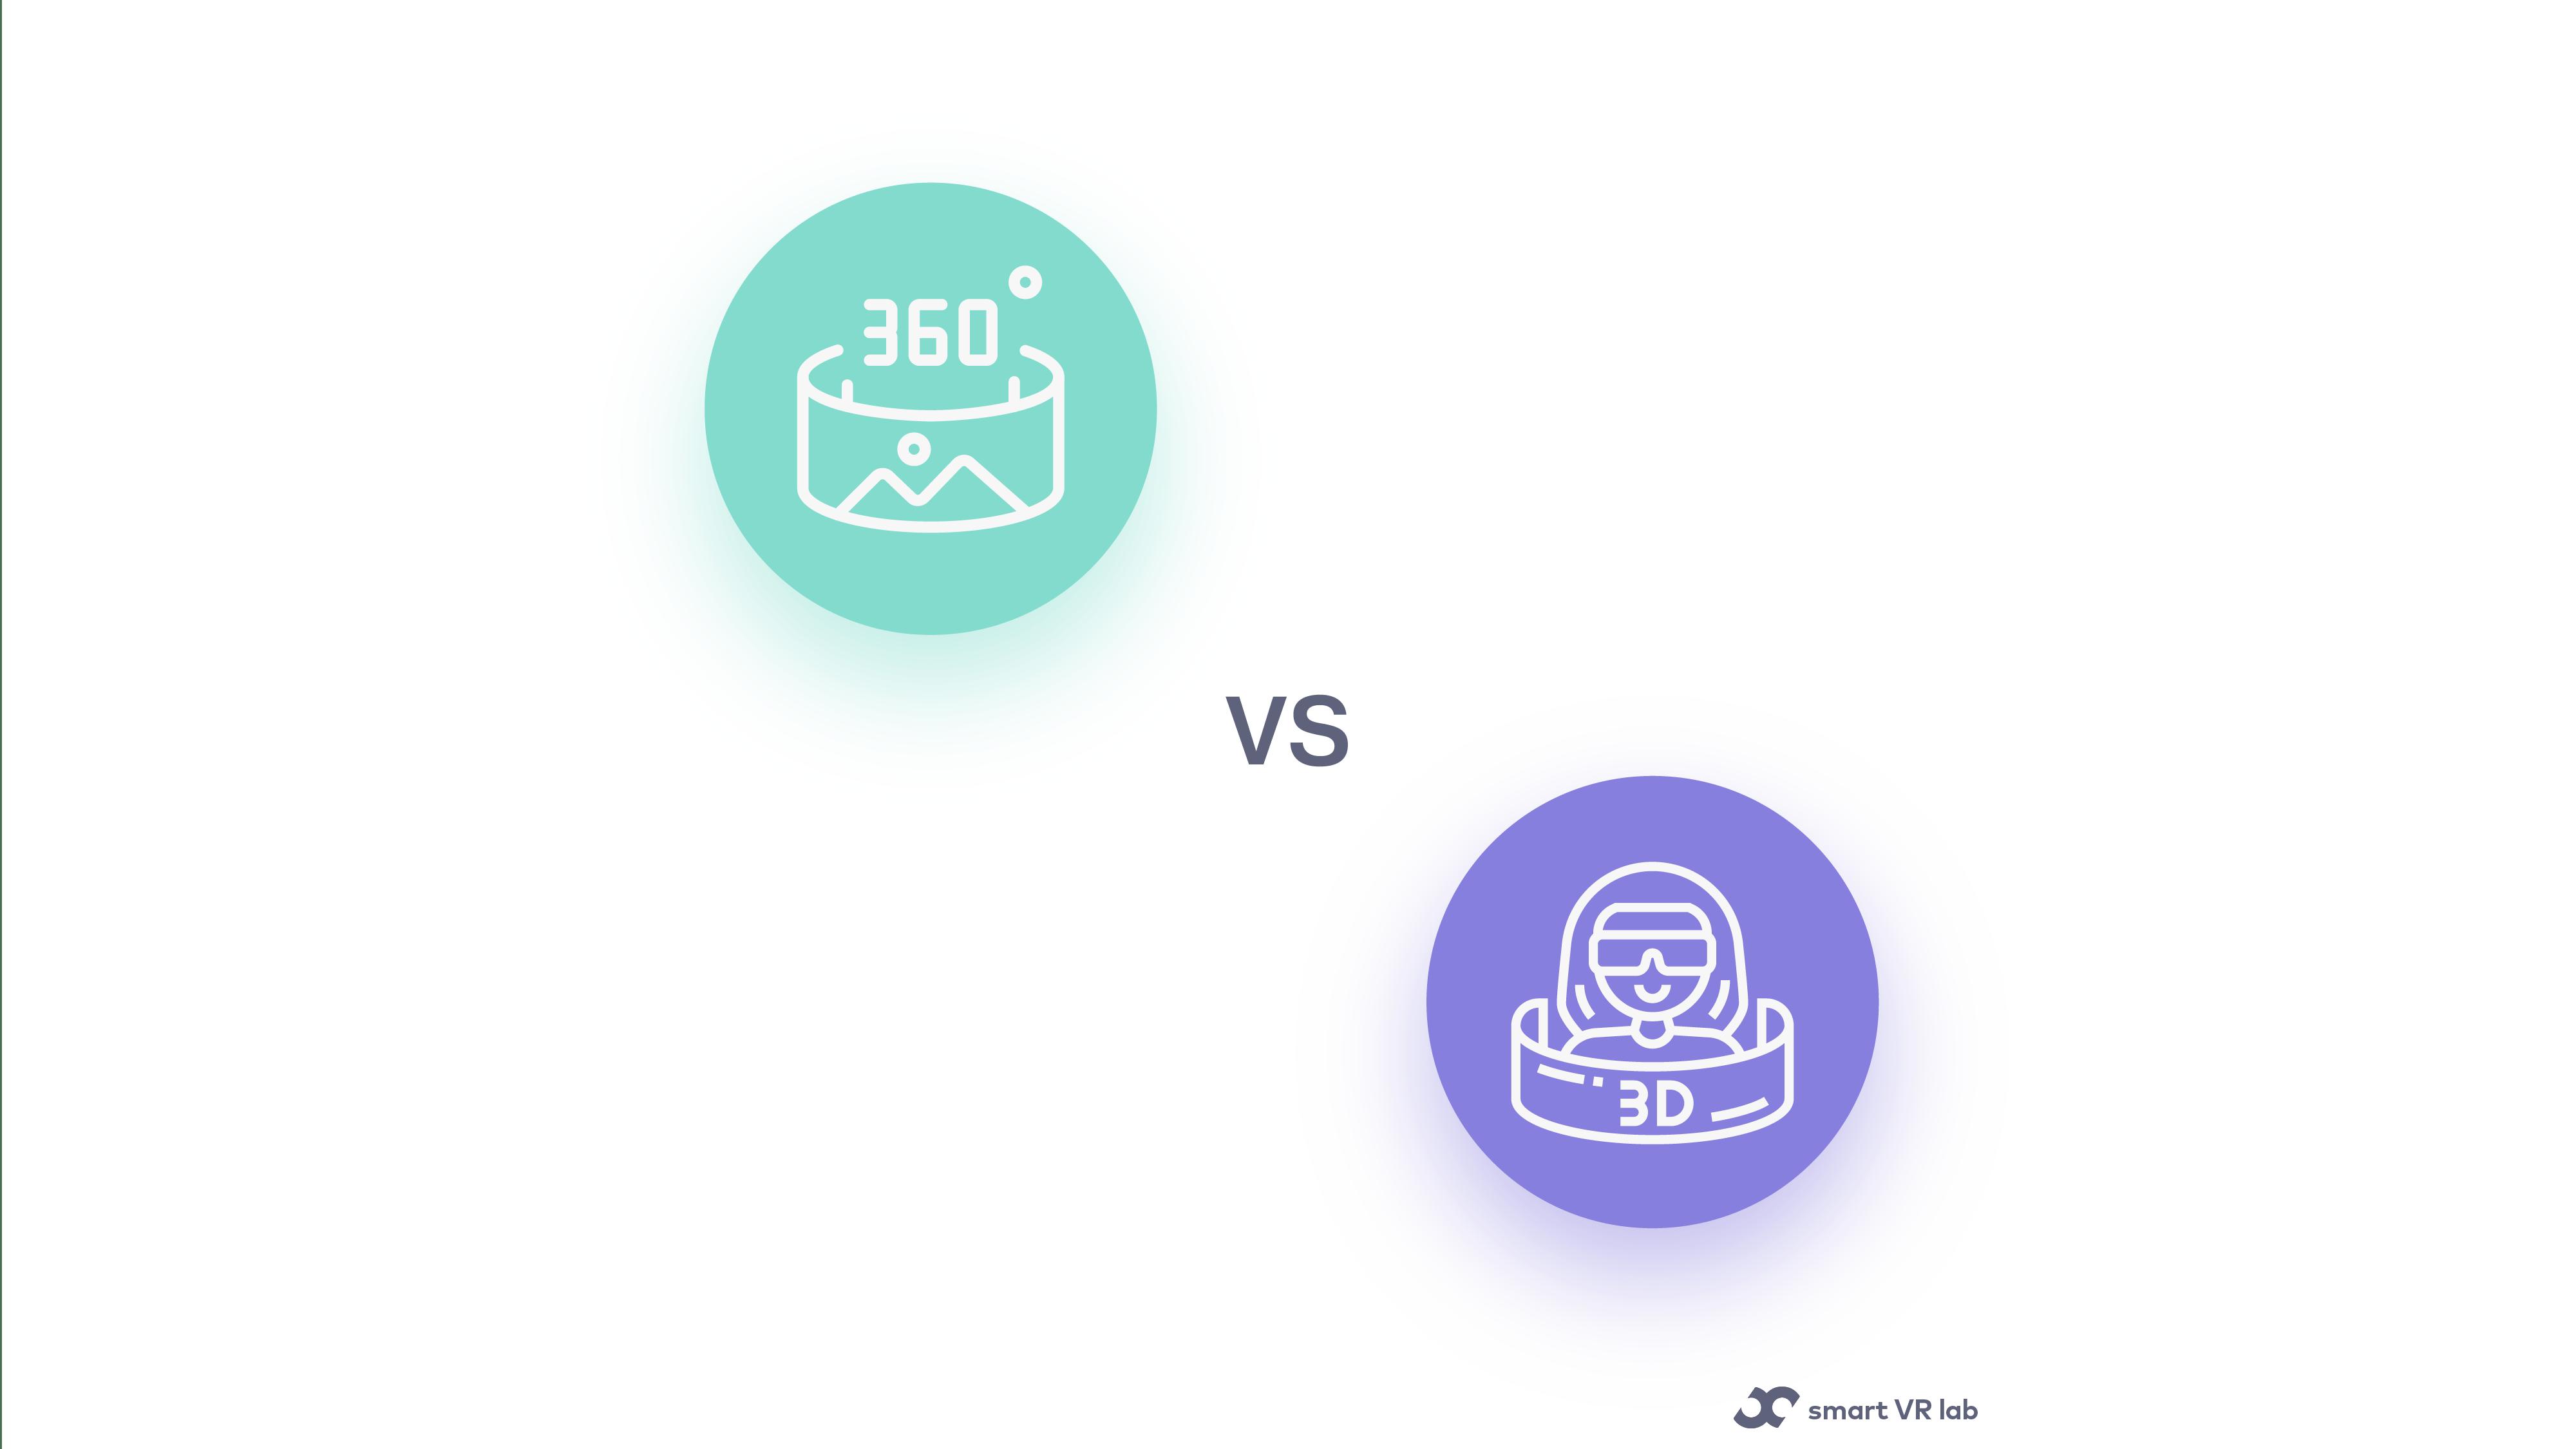 360 video vs 3D VR